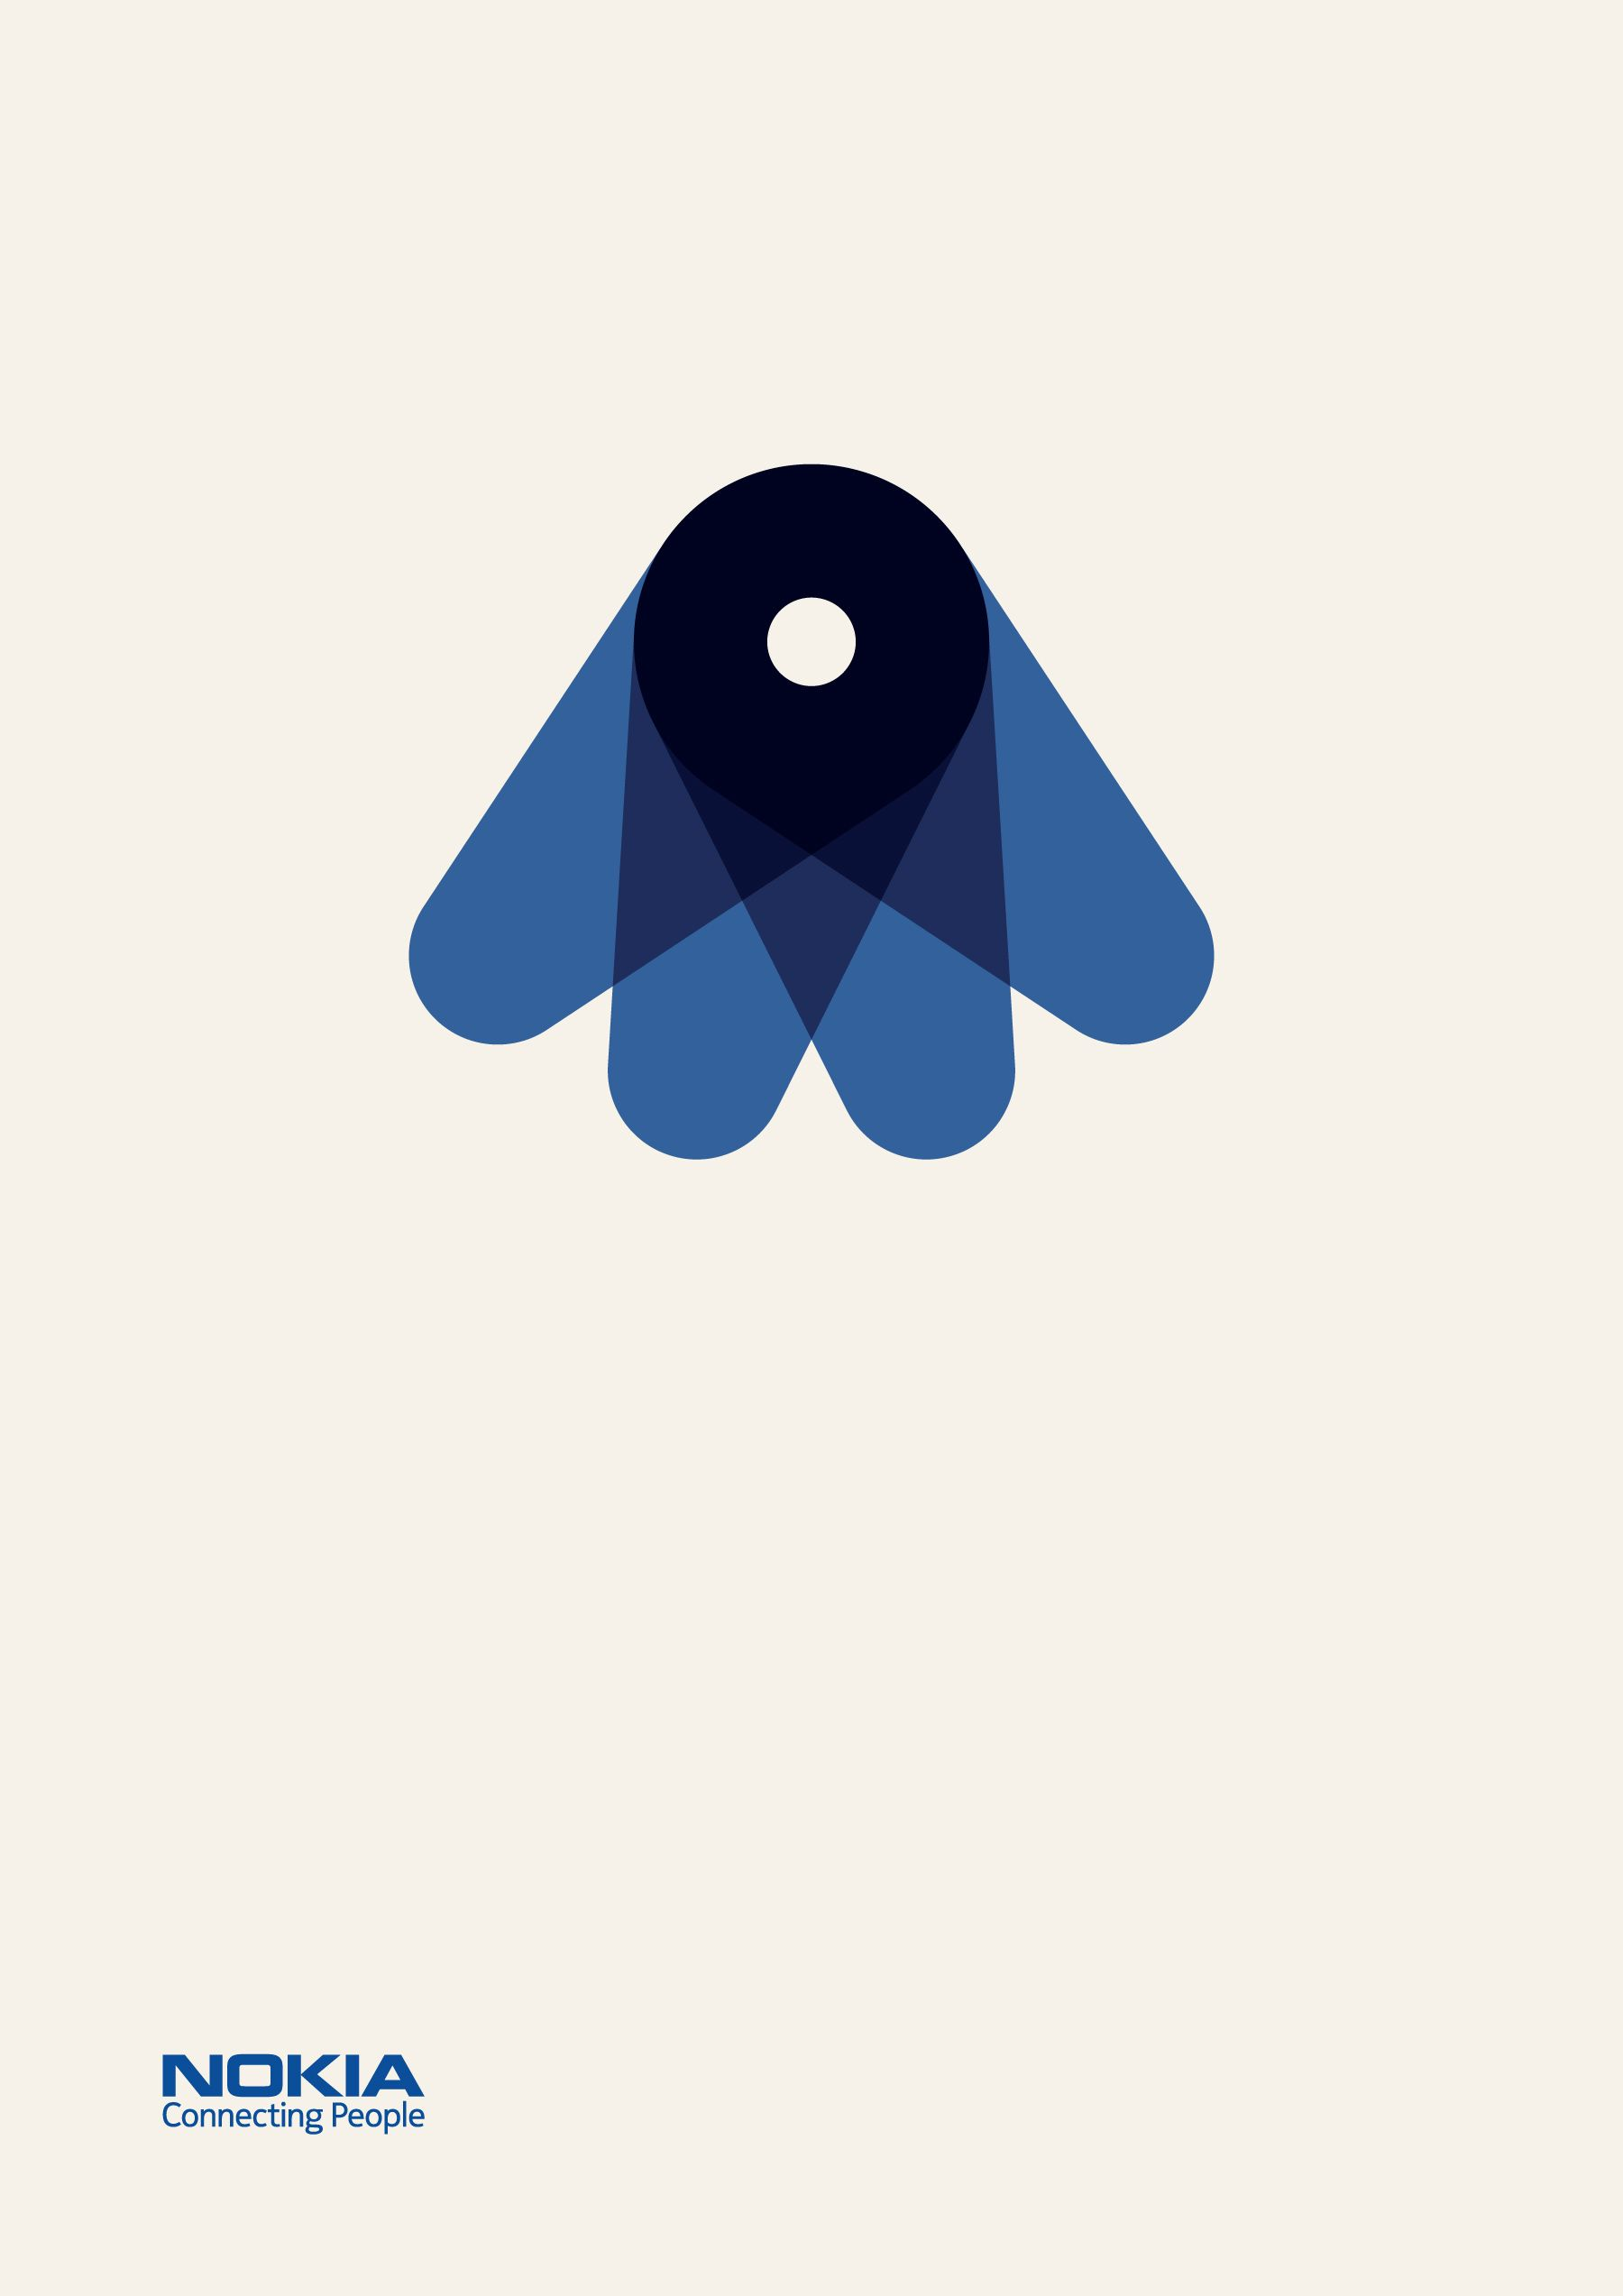 Nokia Pure Illustration Animation — Build